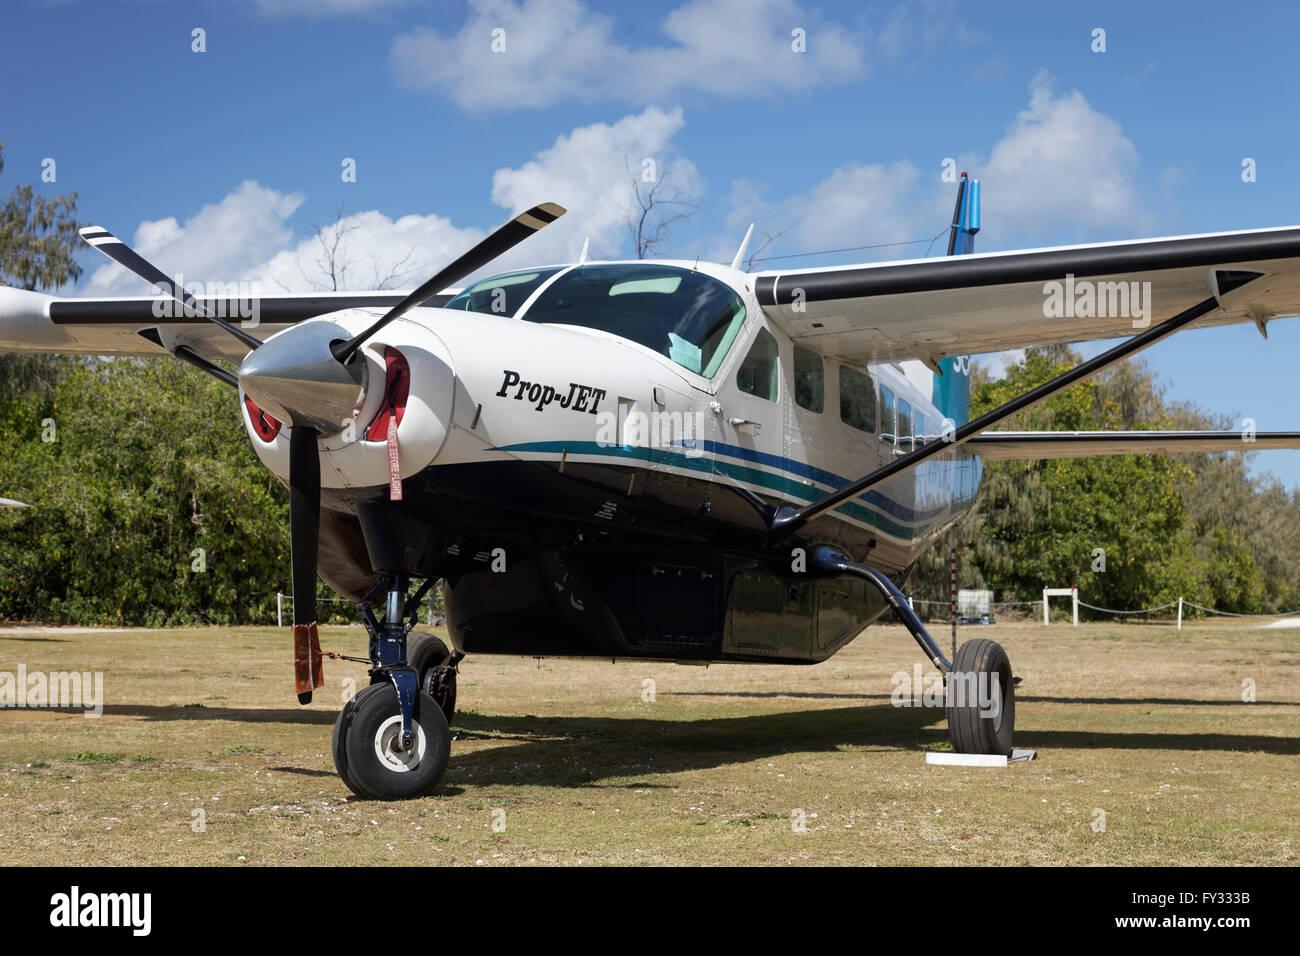 Cessna Caravan 208 Sea Air on unpaved airfield, Lady Elliot Island, Queensland, Australia - Stock Image